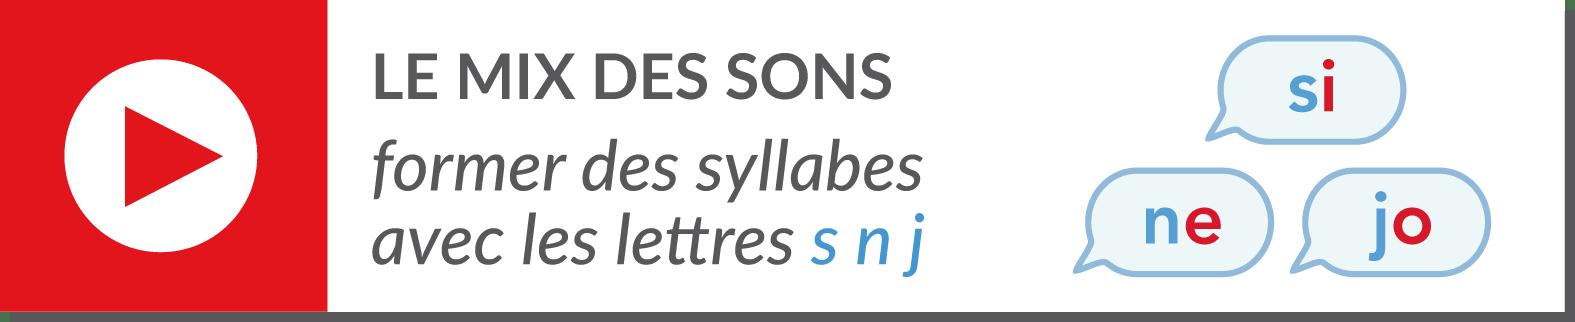 lecture de syllabes - vidéo syllabes - lettres s n j